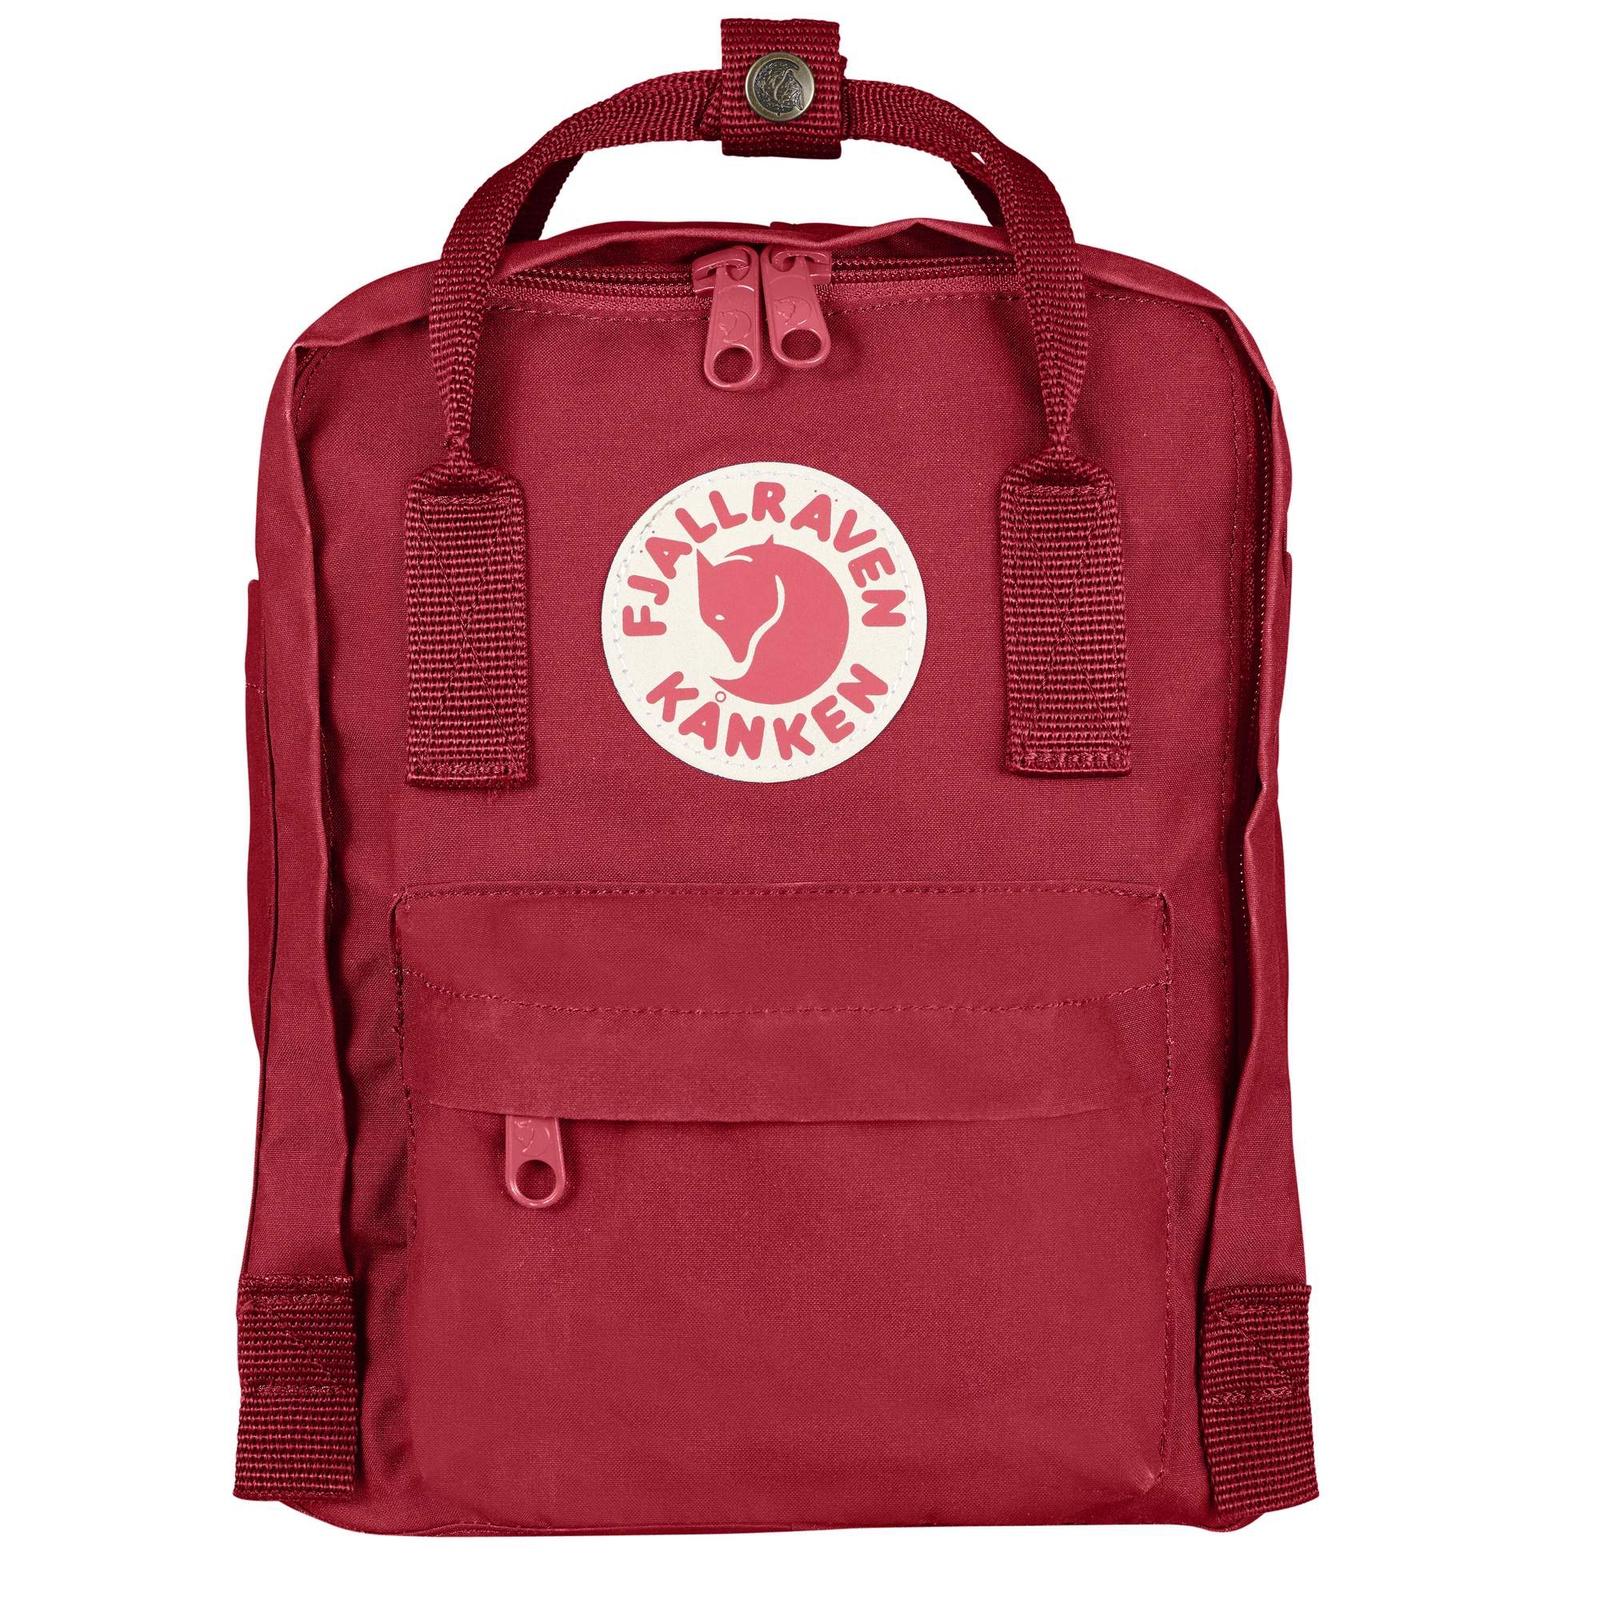 Рюкзак Fjallraven Kanken Mini 325, красный цена и фото